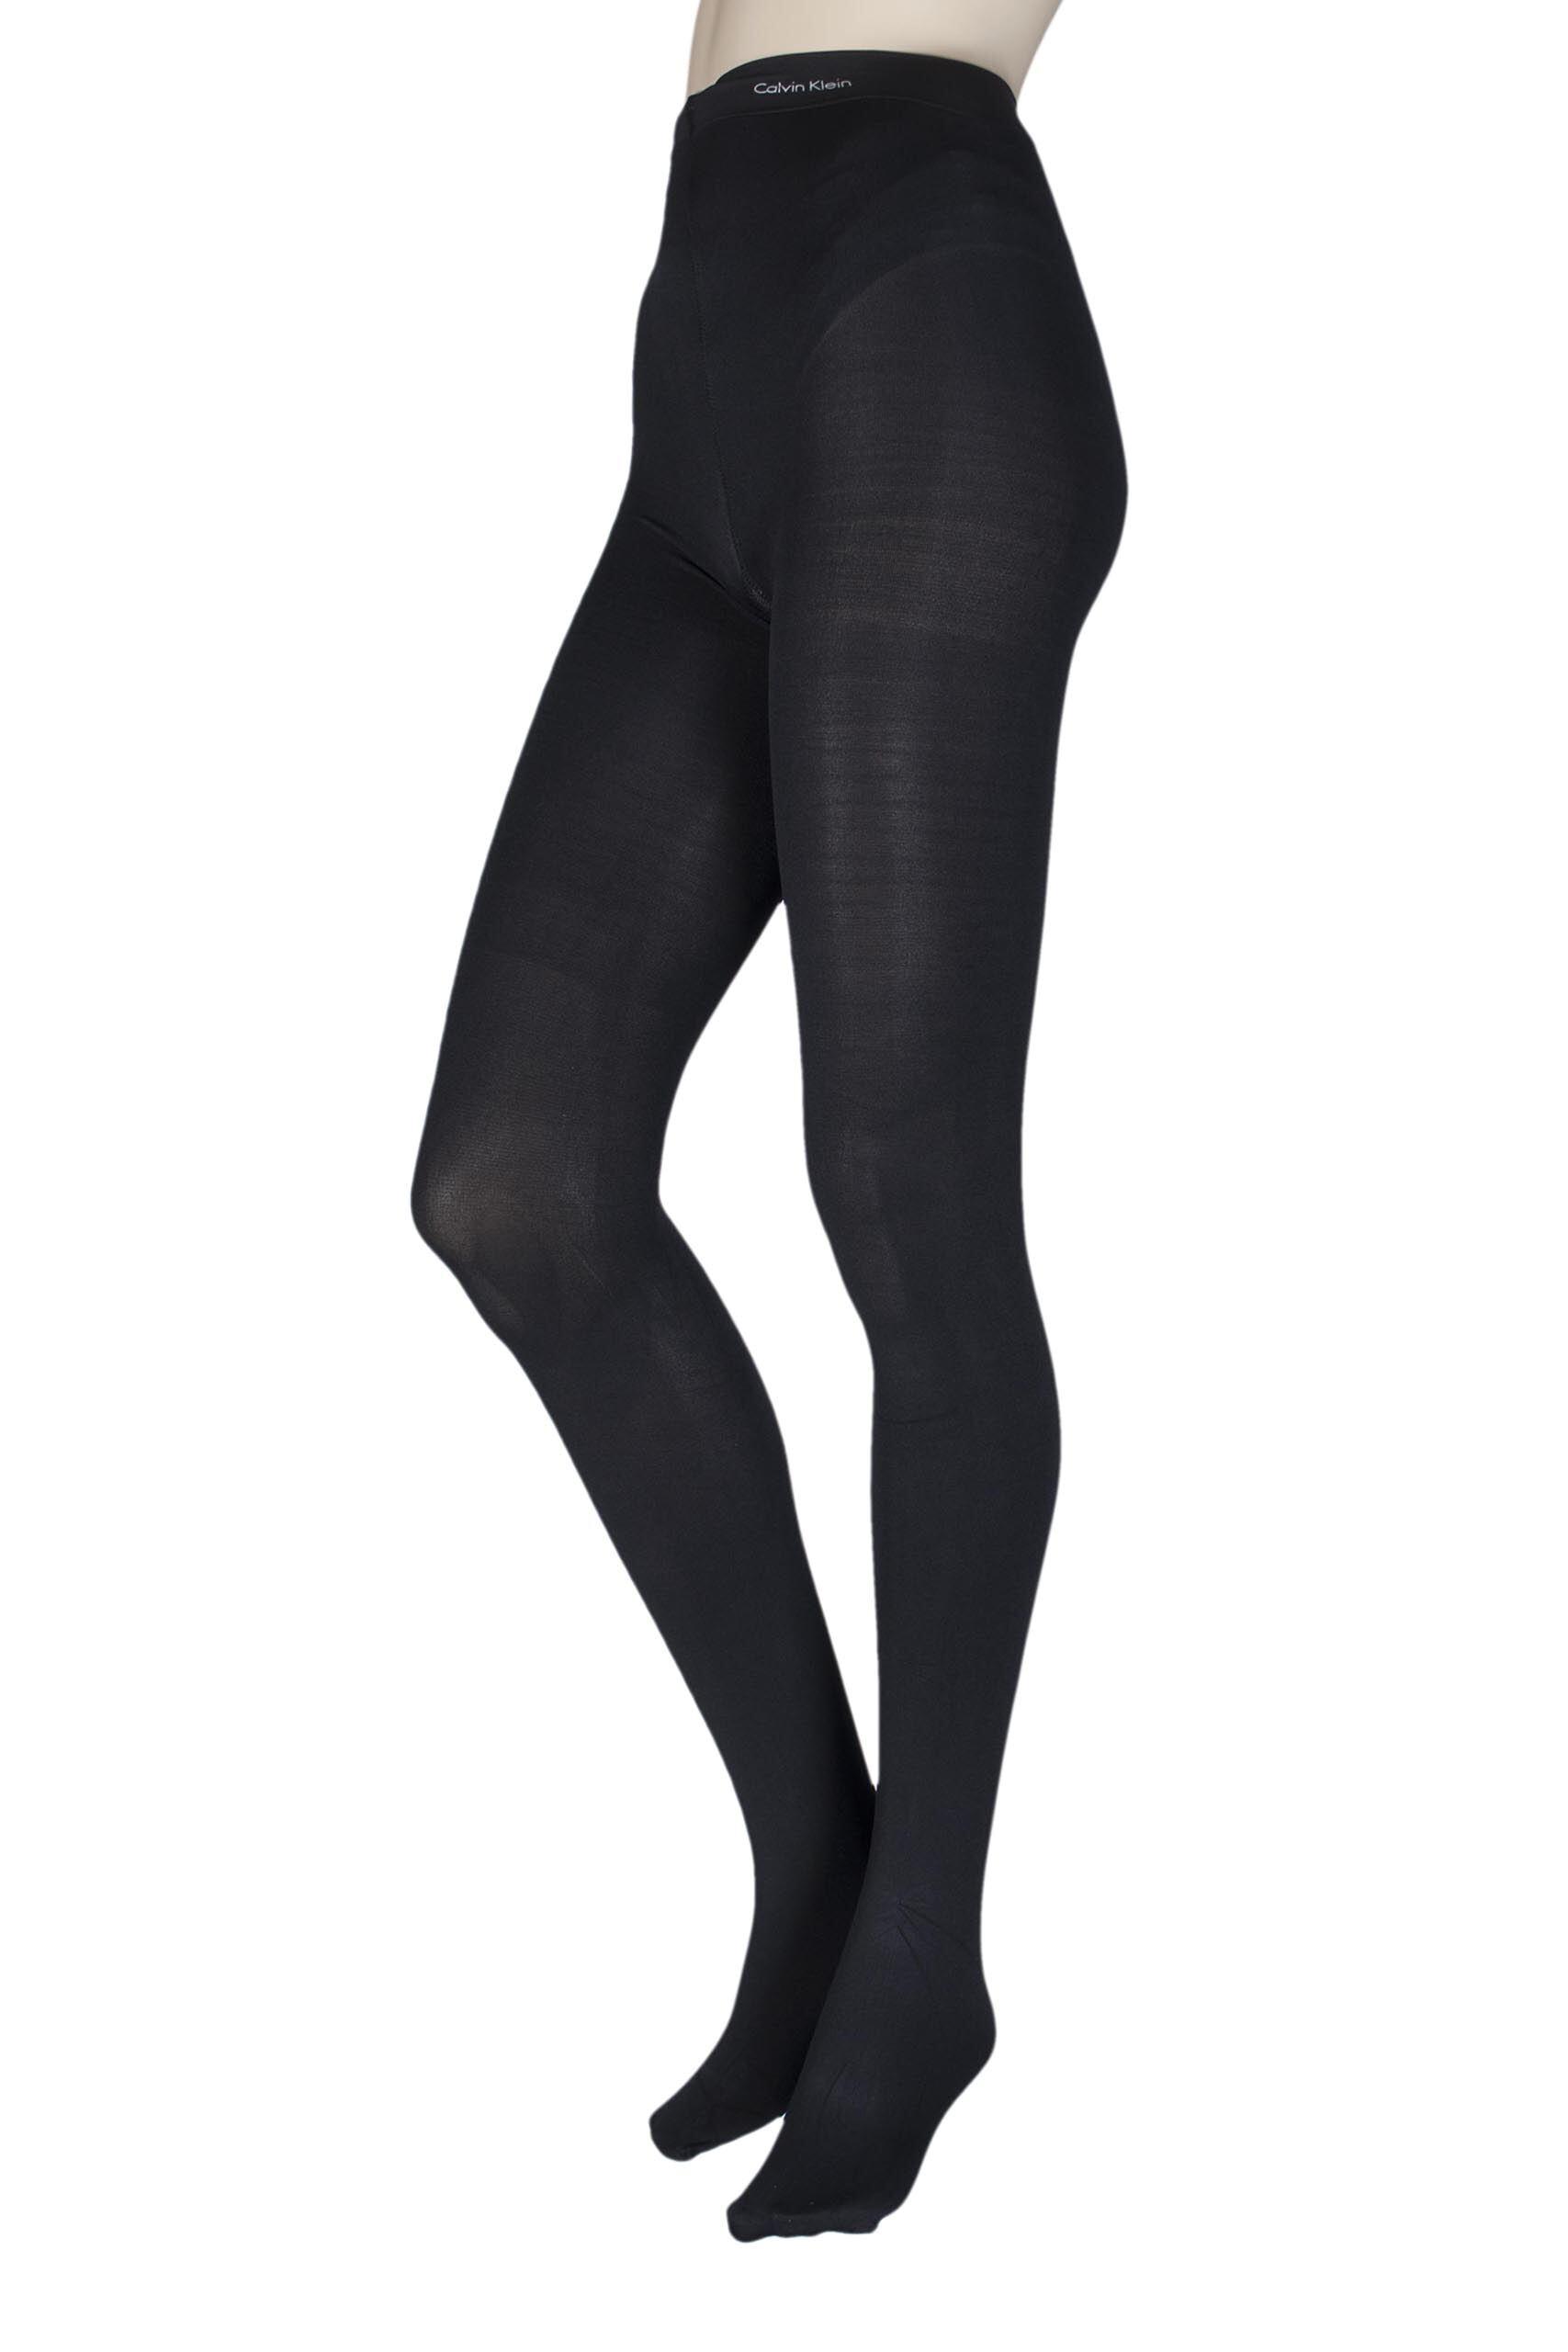 Image of 1 Pair Black Opaque Essentials Infinate Tights Ladies Large - Calvin Klein